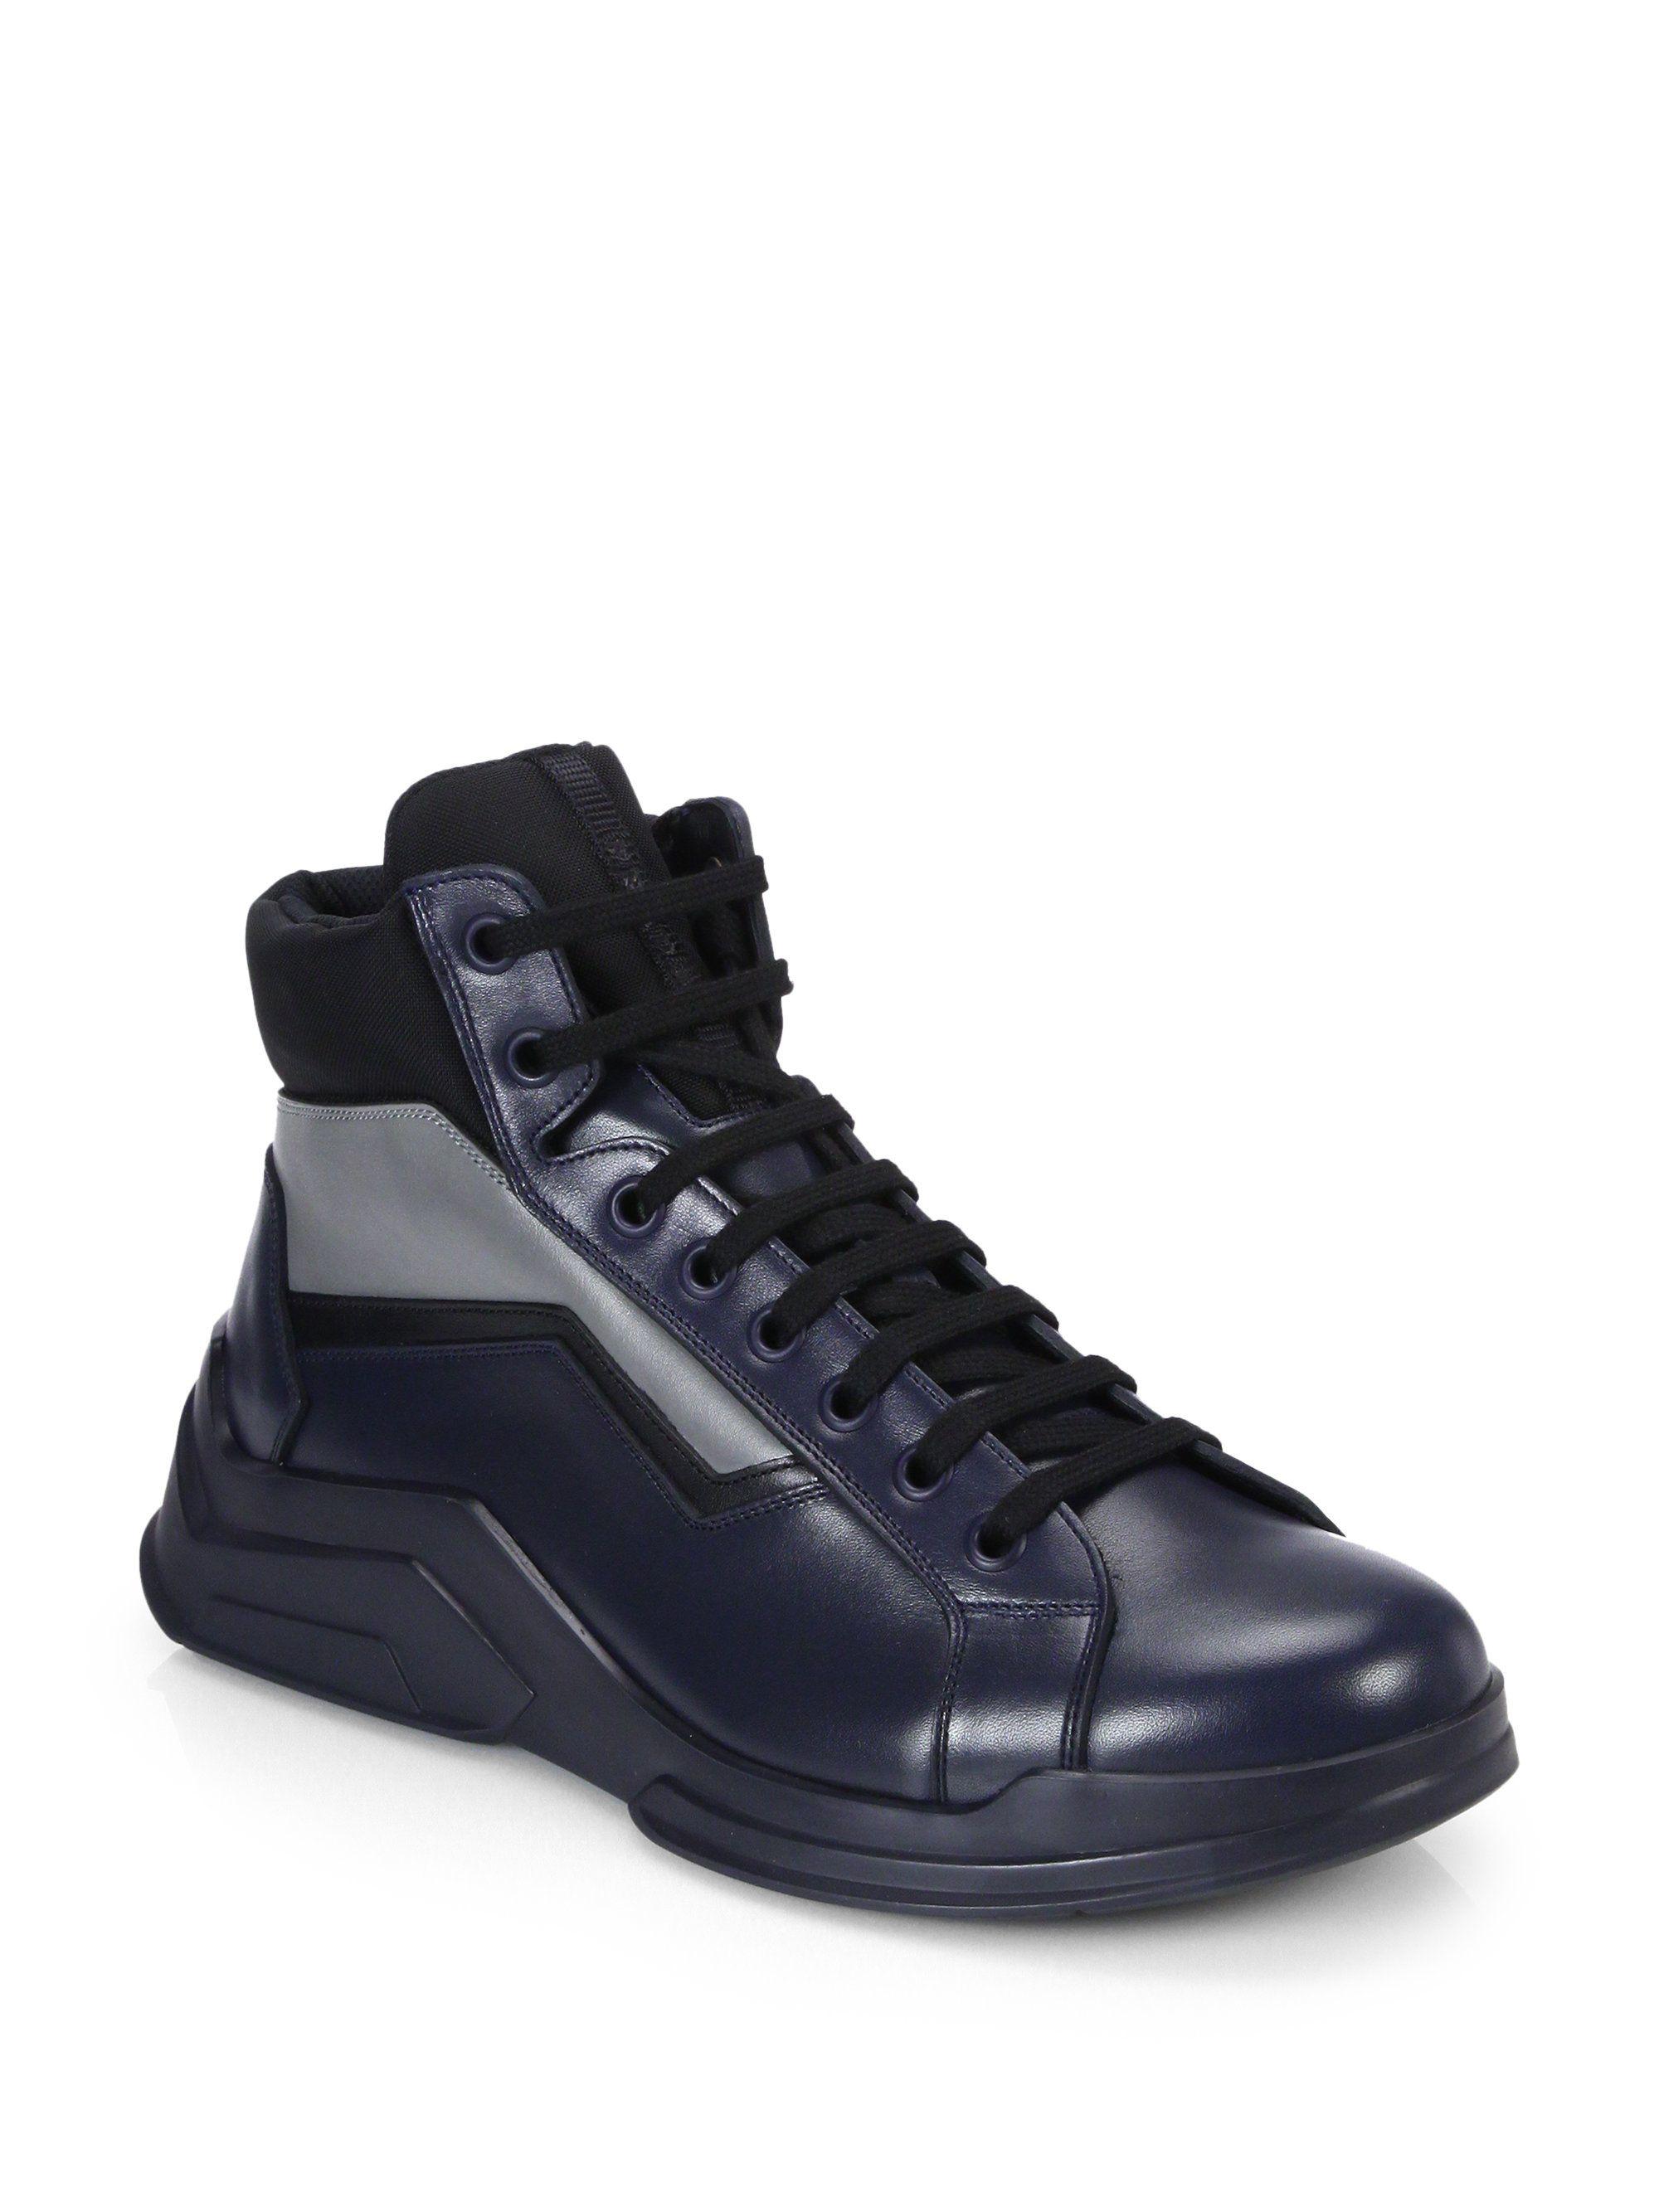 Prada Leather High Trainers AYmuv9trh5